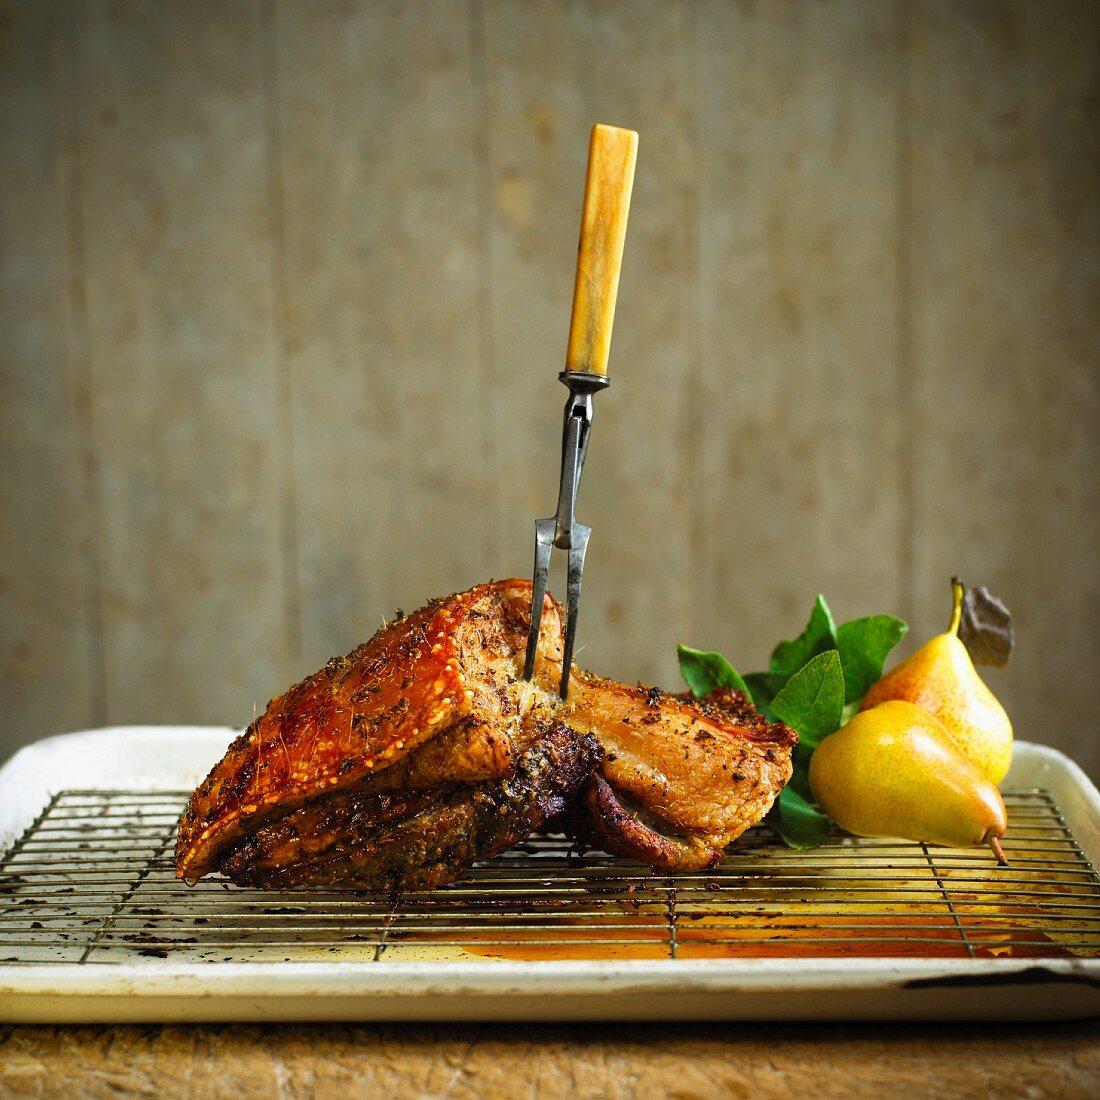 Crispy roasted pork belly with a meat fork